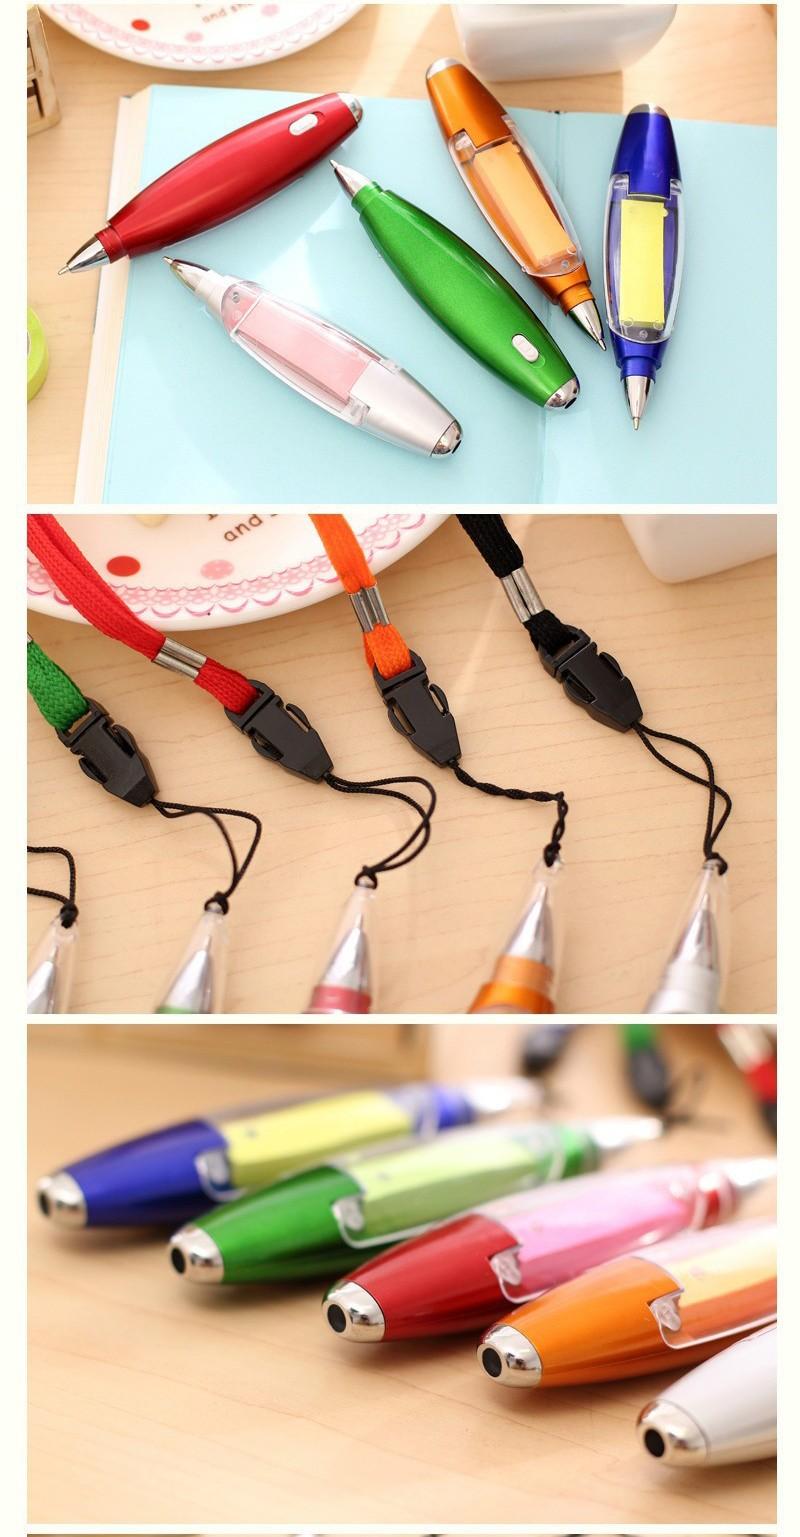 Ручка блокнот с фонариком ручка шпаргалка с бумагой внутри 07 - Ручка-блокнот с фонариком, ручка-шпаргалка с бумагой внутри